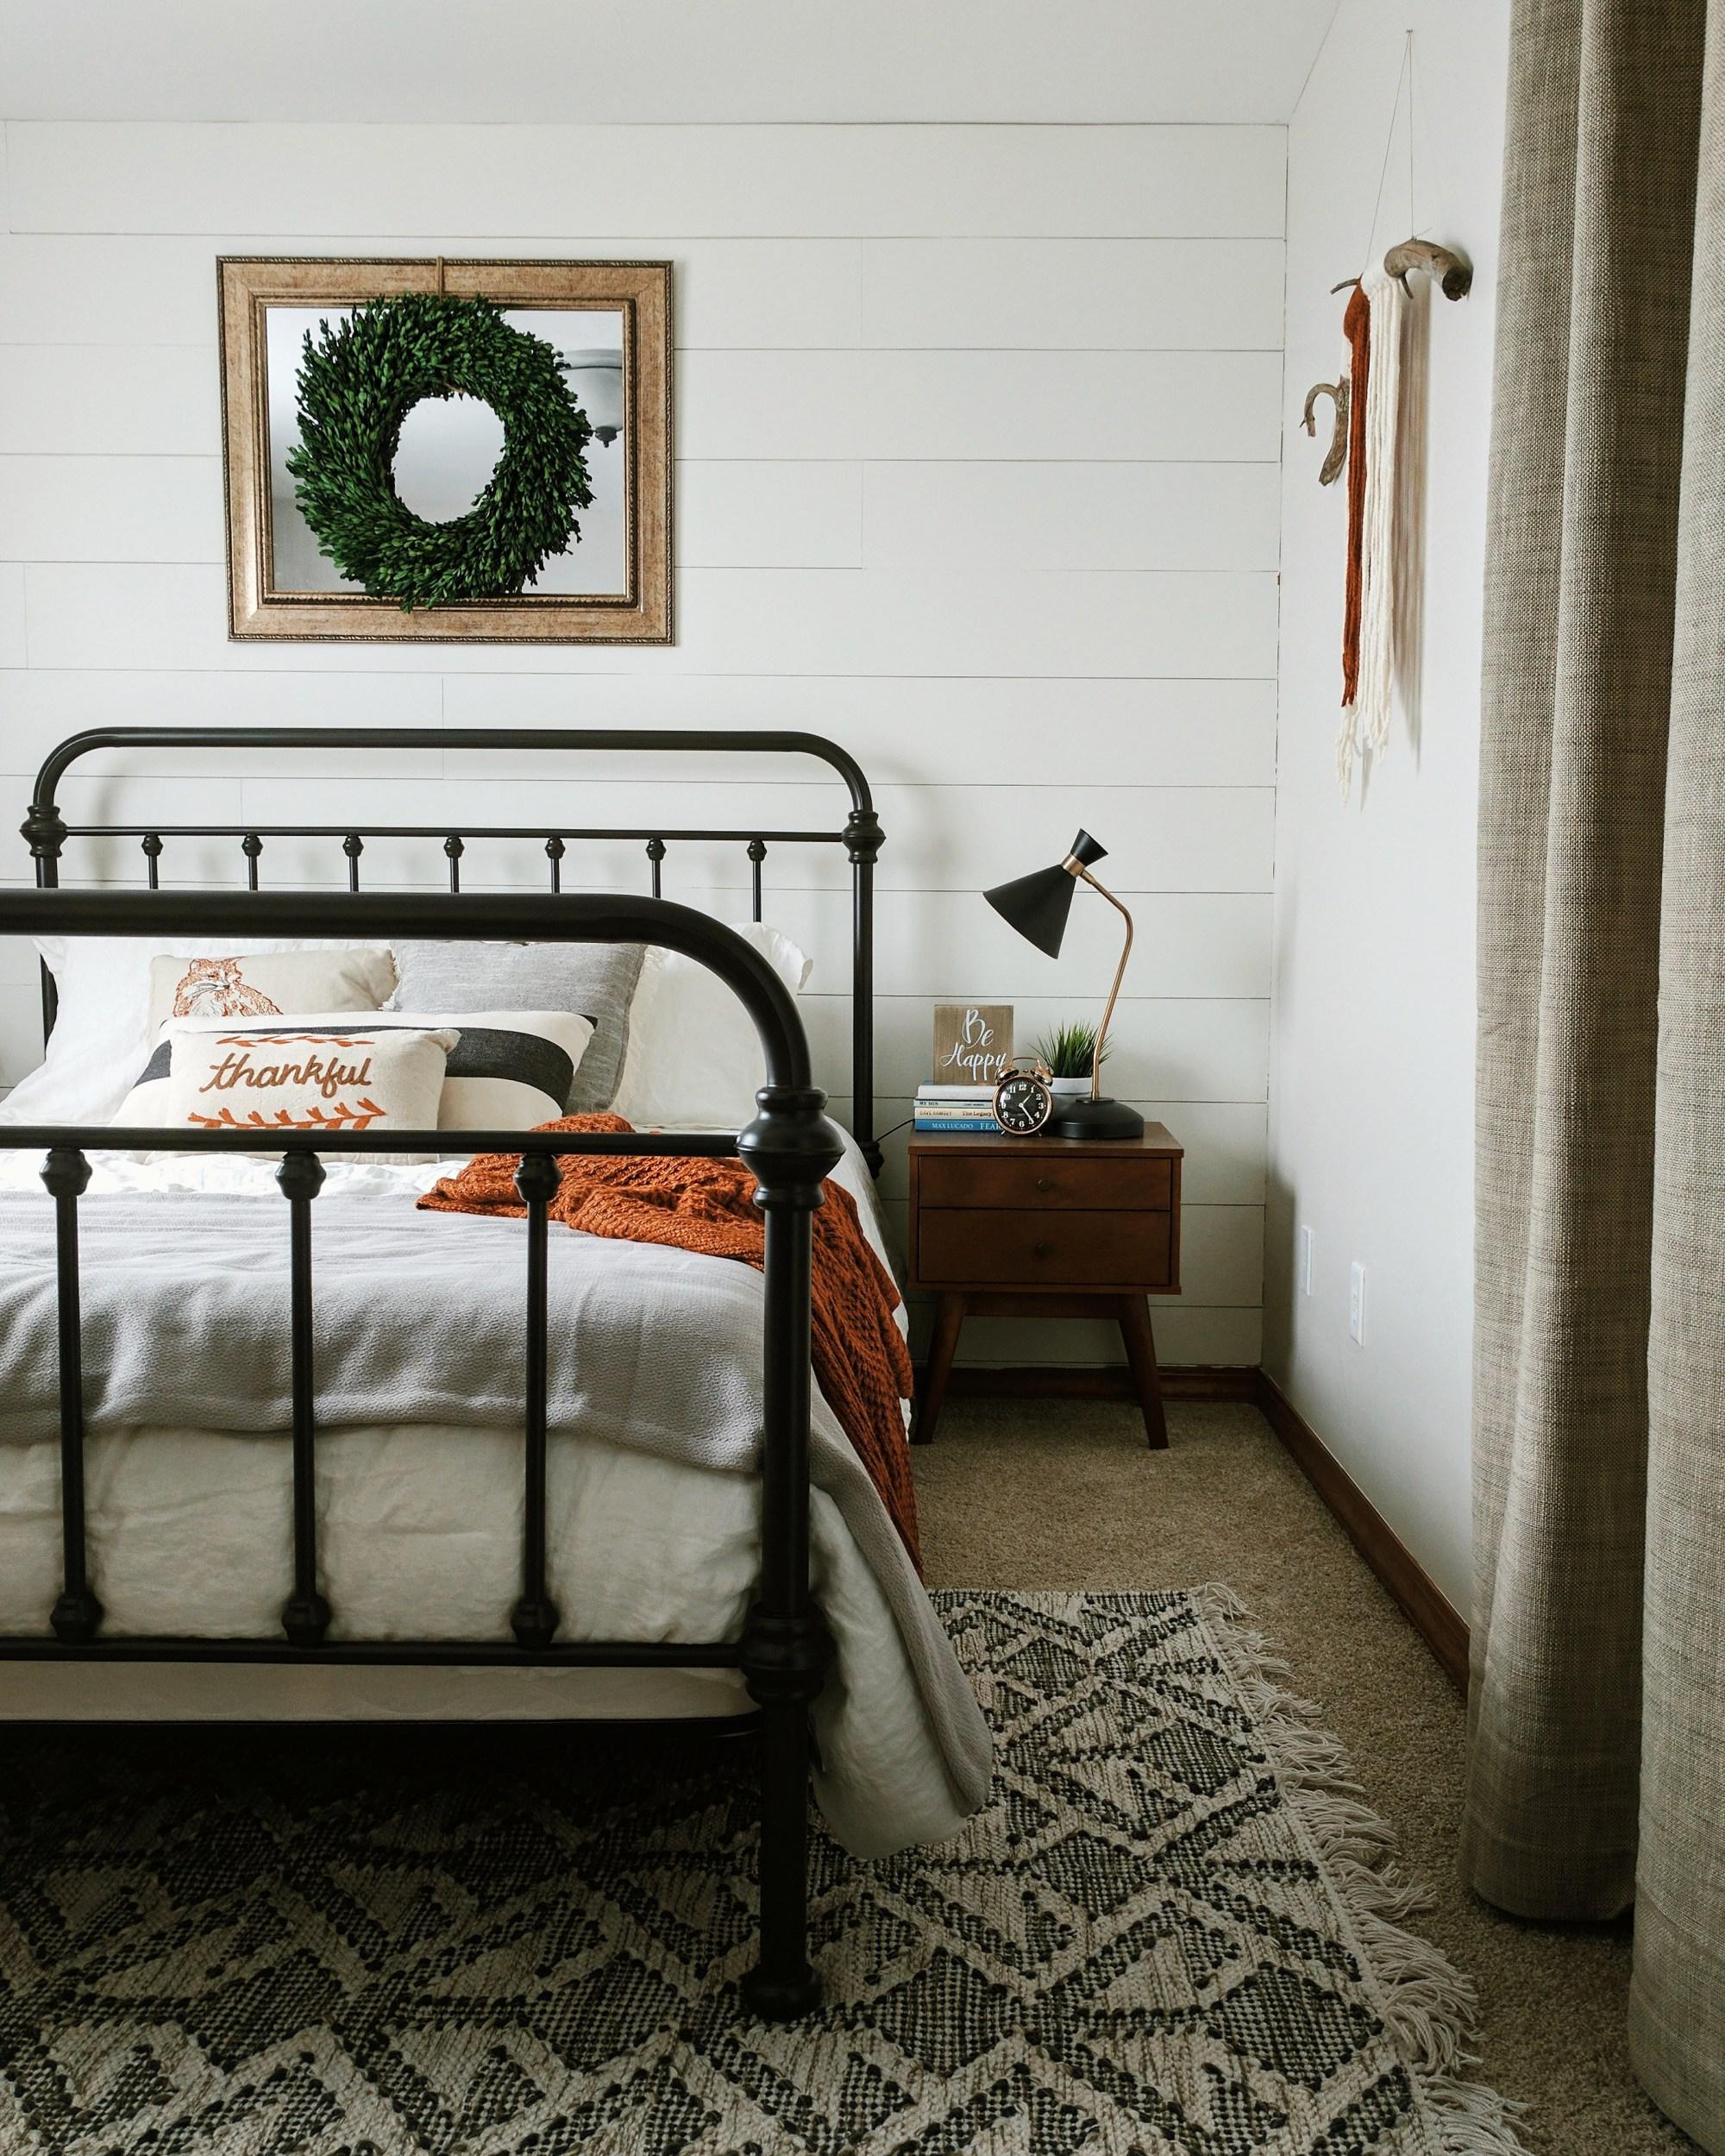 Modern farmhouse bedroom with shiplap wall // shiplap wall in bedroom